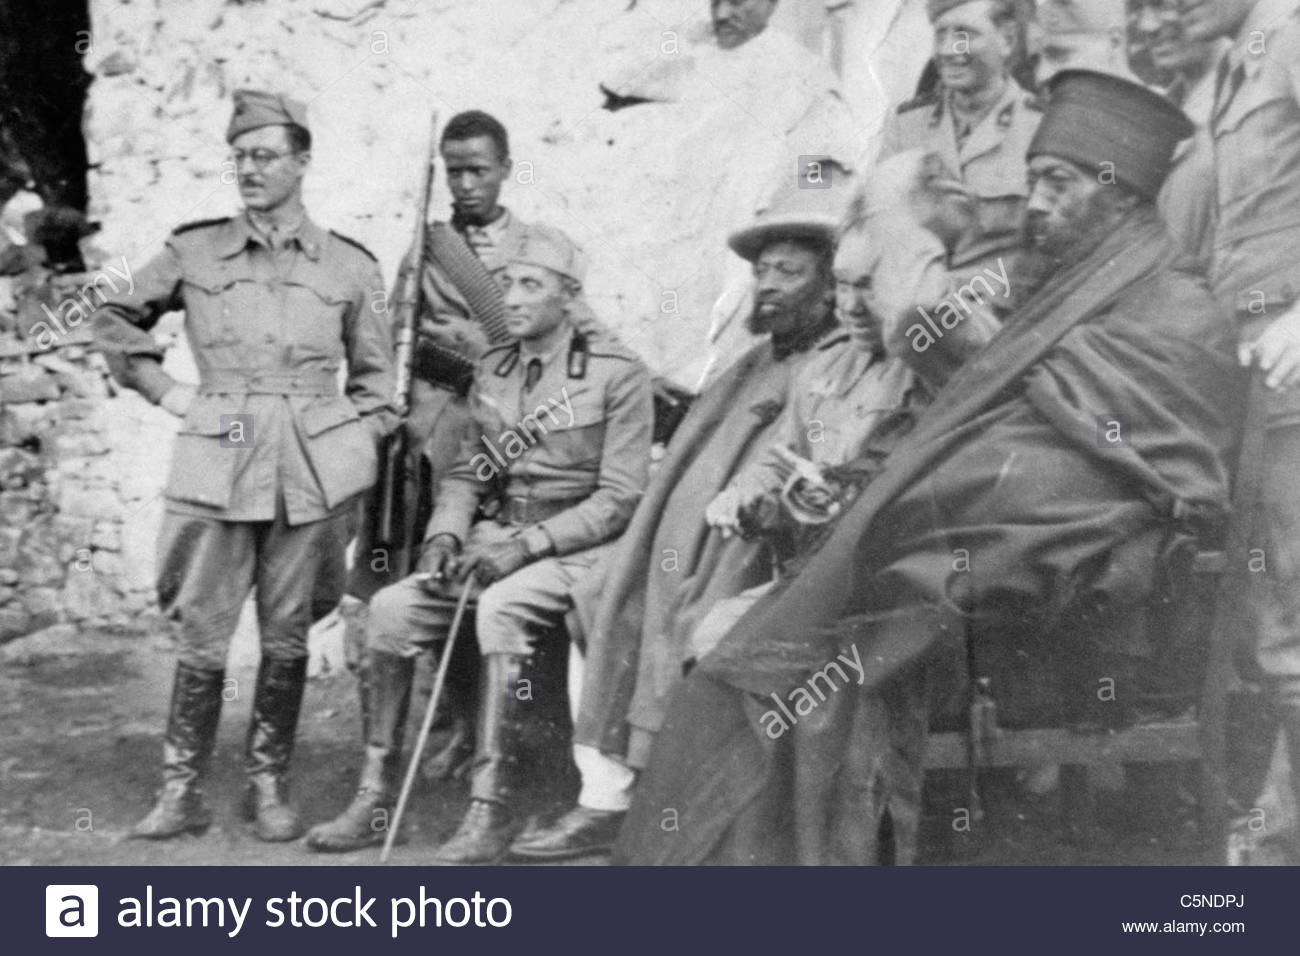 La invasión italiana de Abisinia, África, 1935 Imagen De Stock